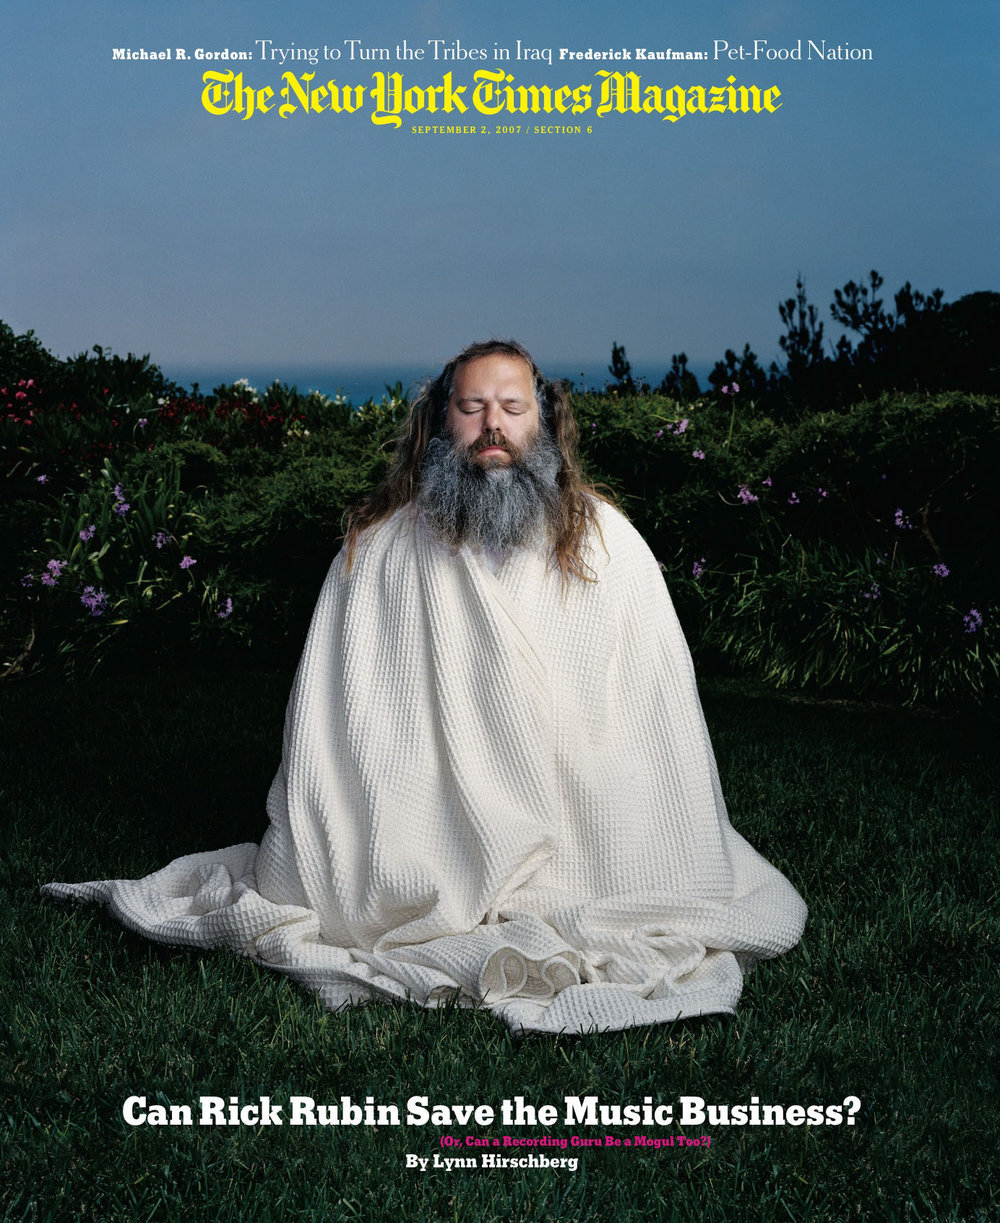 COVER.09.02.07.RickRubin.jpg